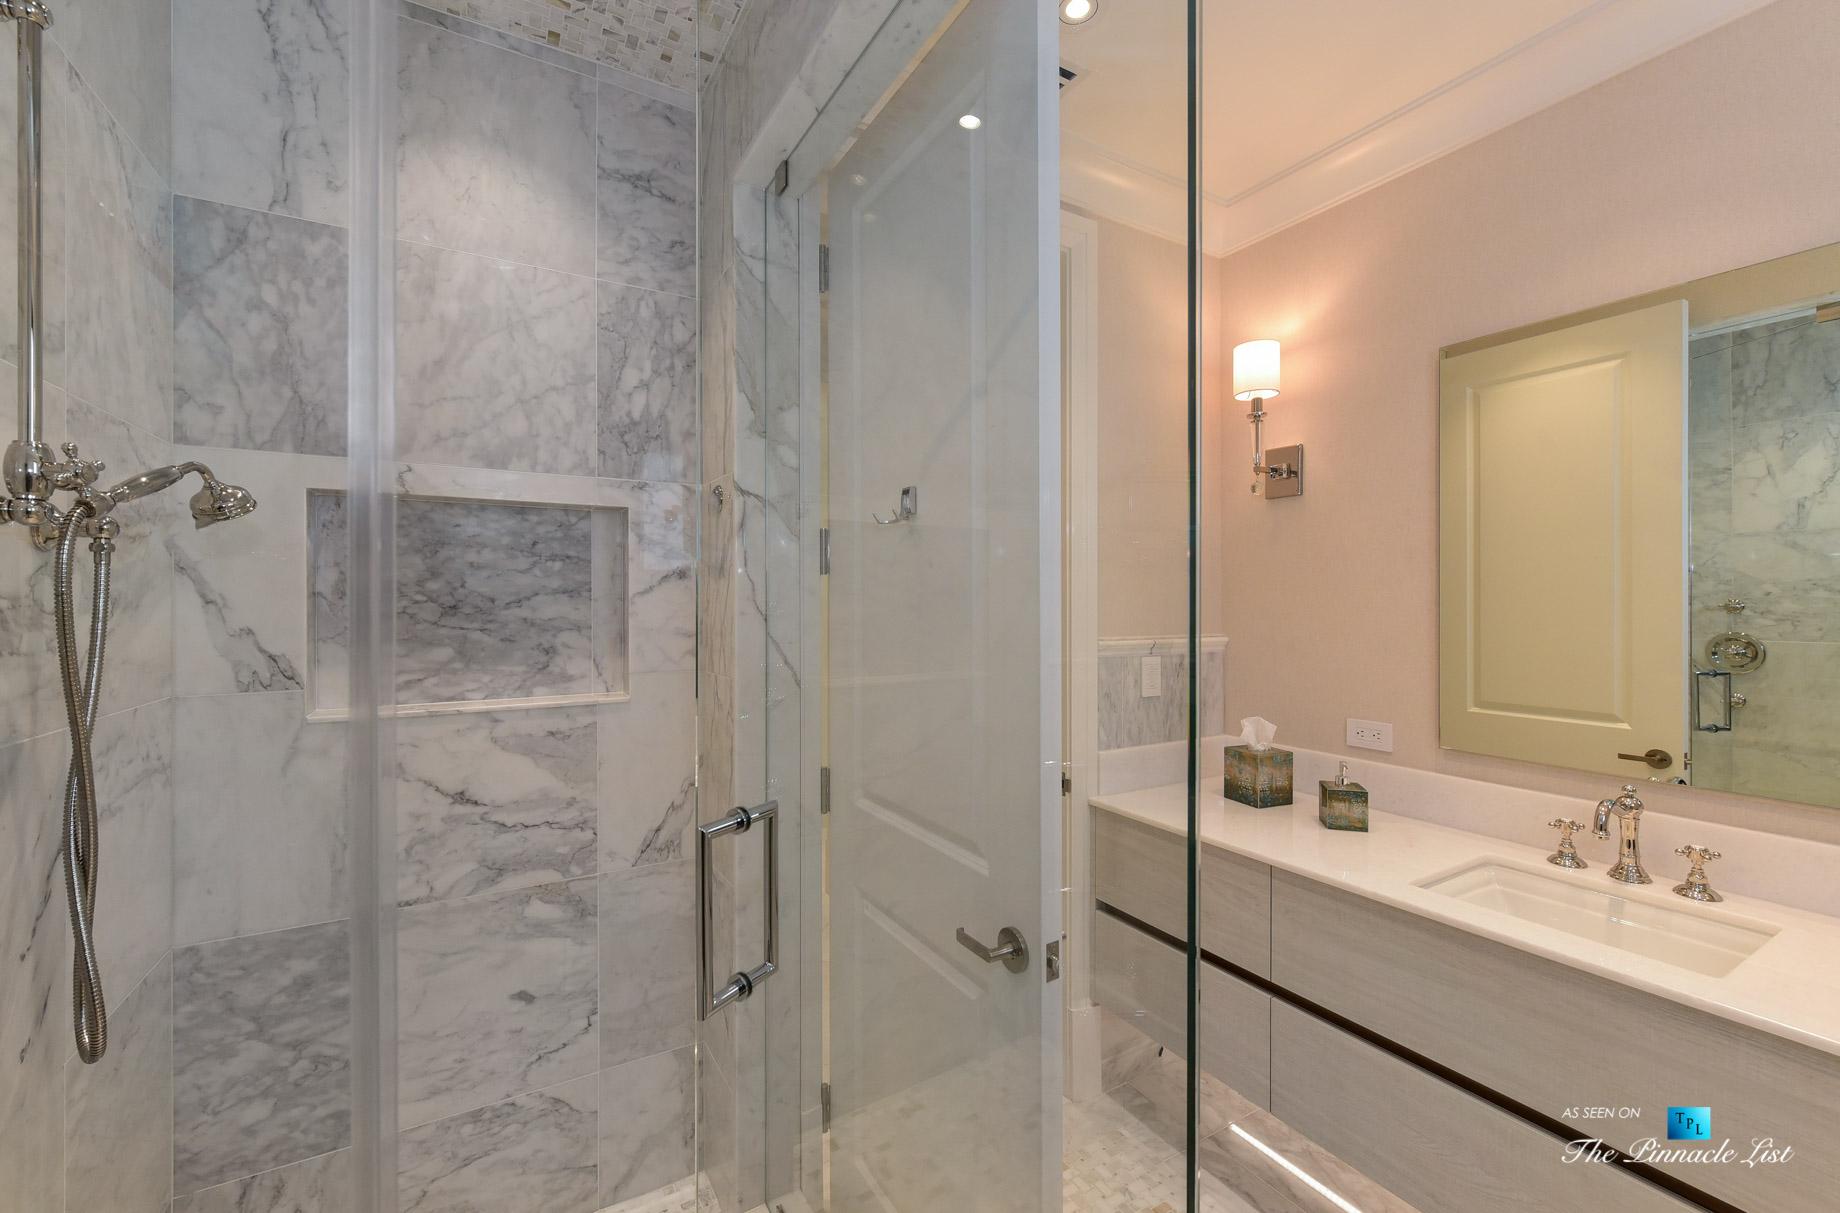 103 Andros Rd, Key Largo, FL, USA - Bathroom Shower - Luxury Real Estate - Ocean Reef Club Home